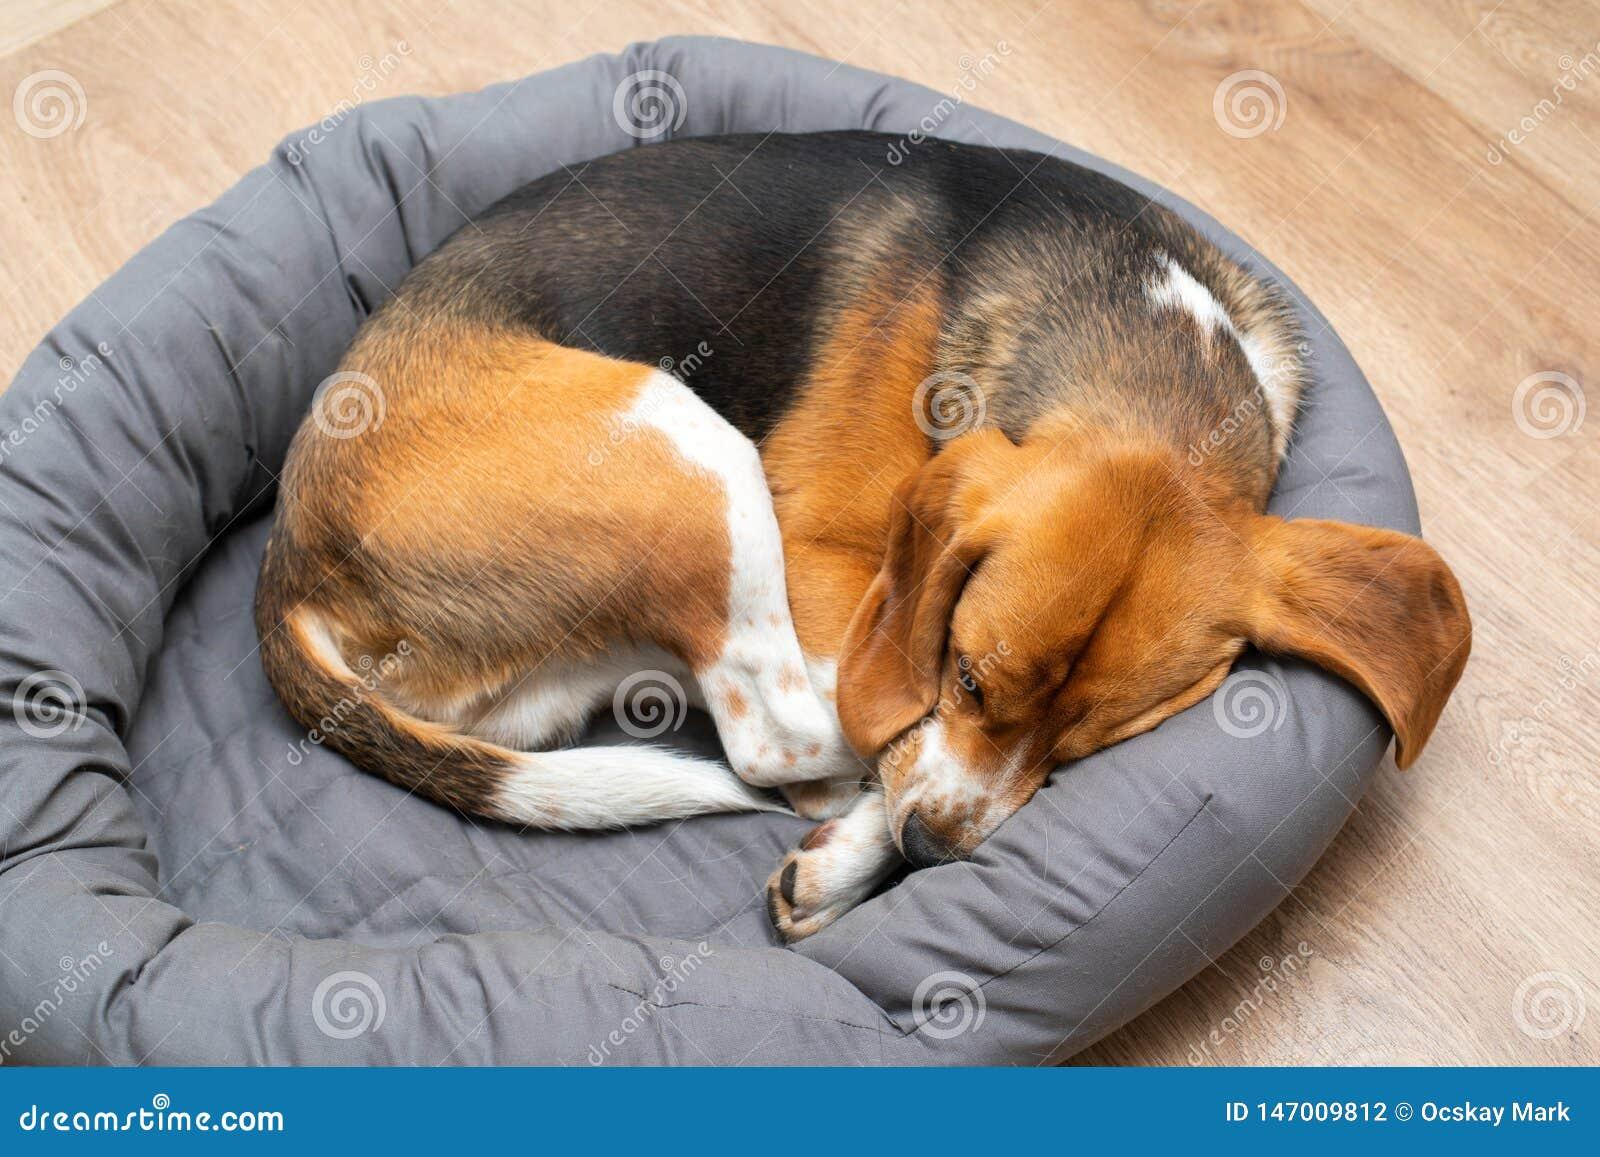 Beagle puppy sleeping at home